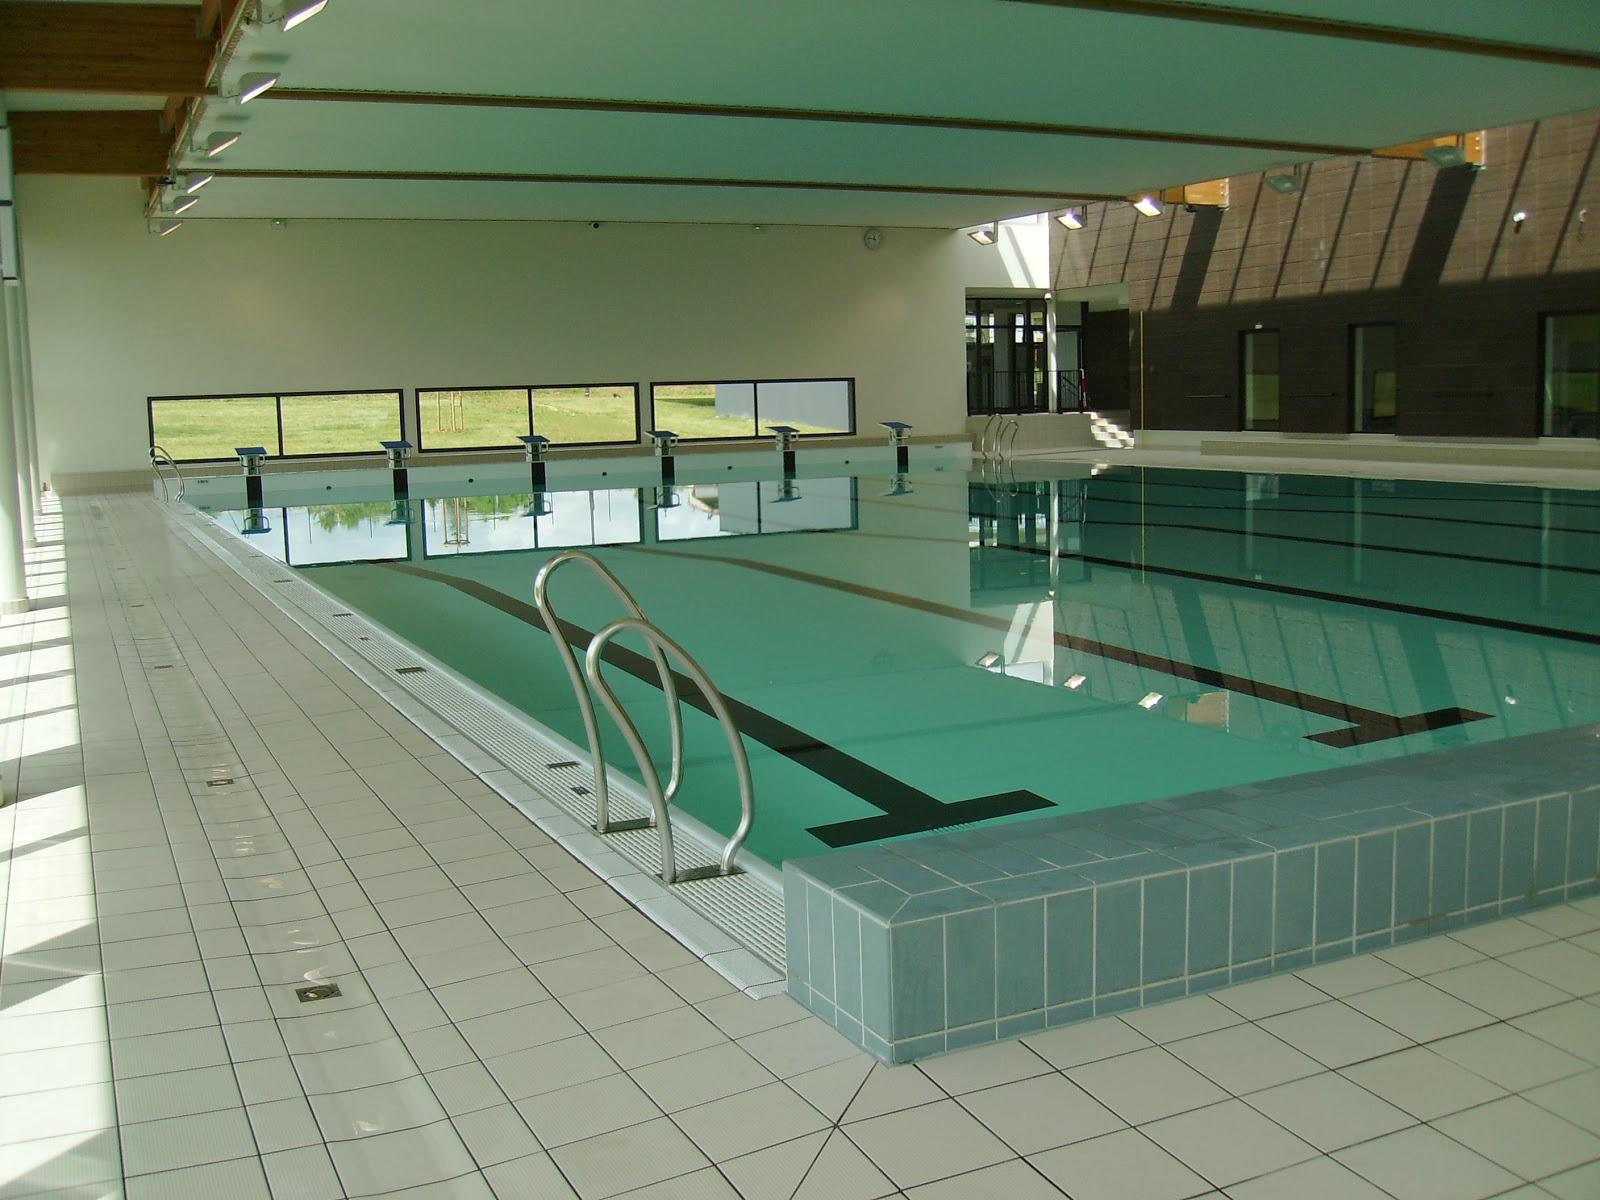 Club aquatique du jarnisy aquapole for Horaire piscine jarny